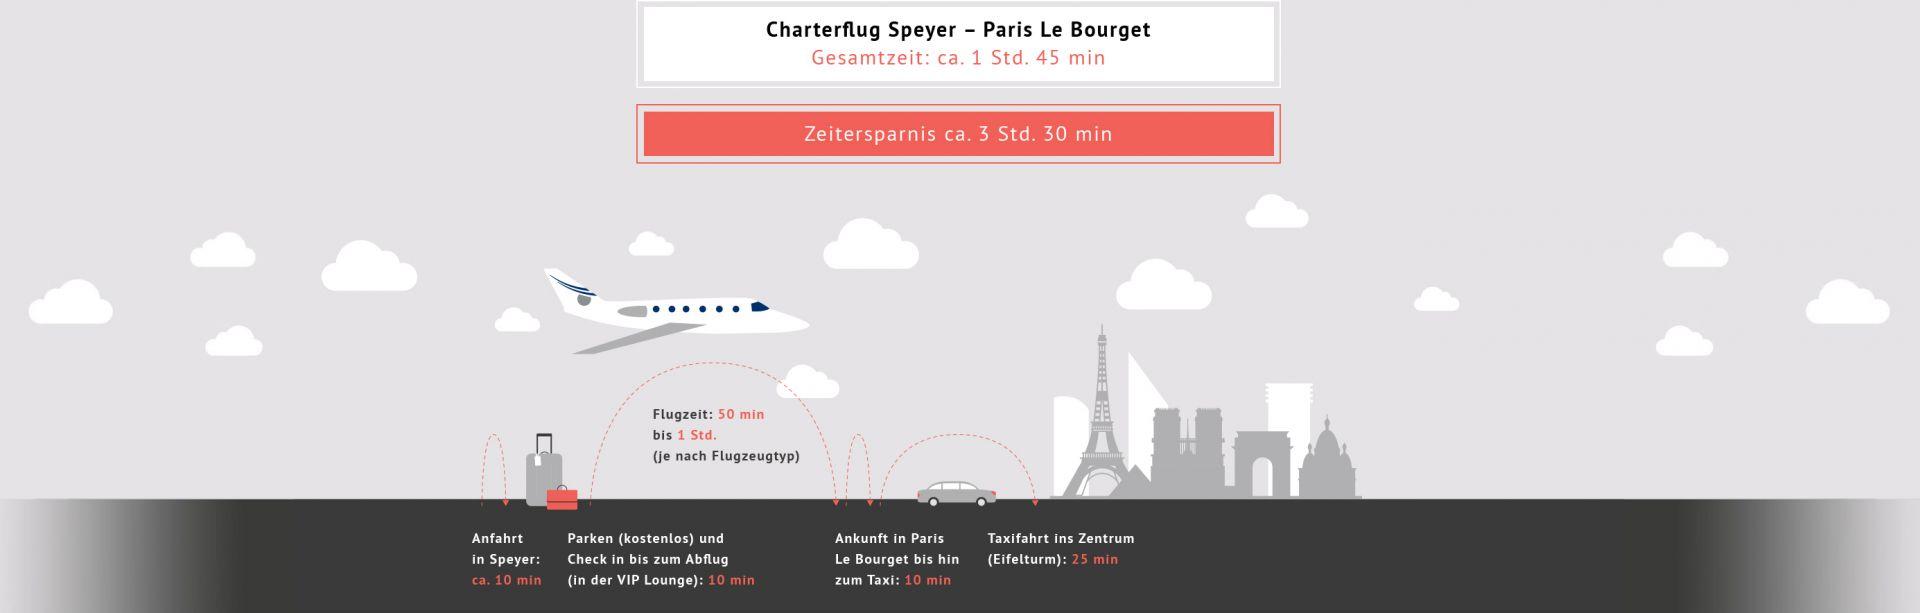 Charterflug_SPY_PAR